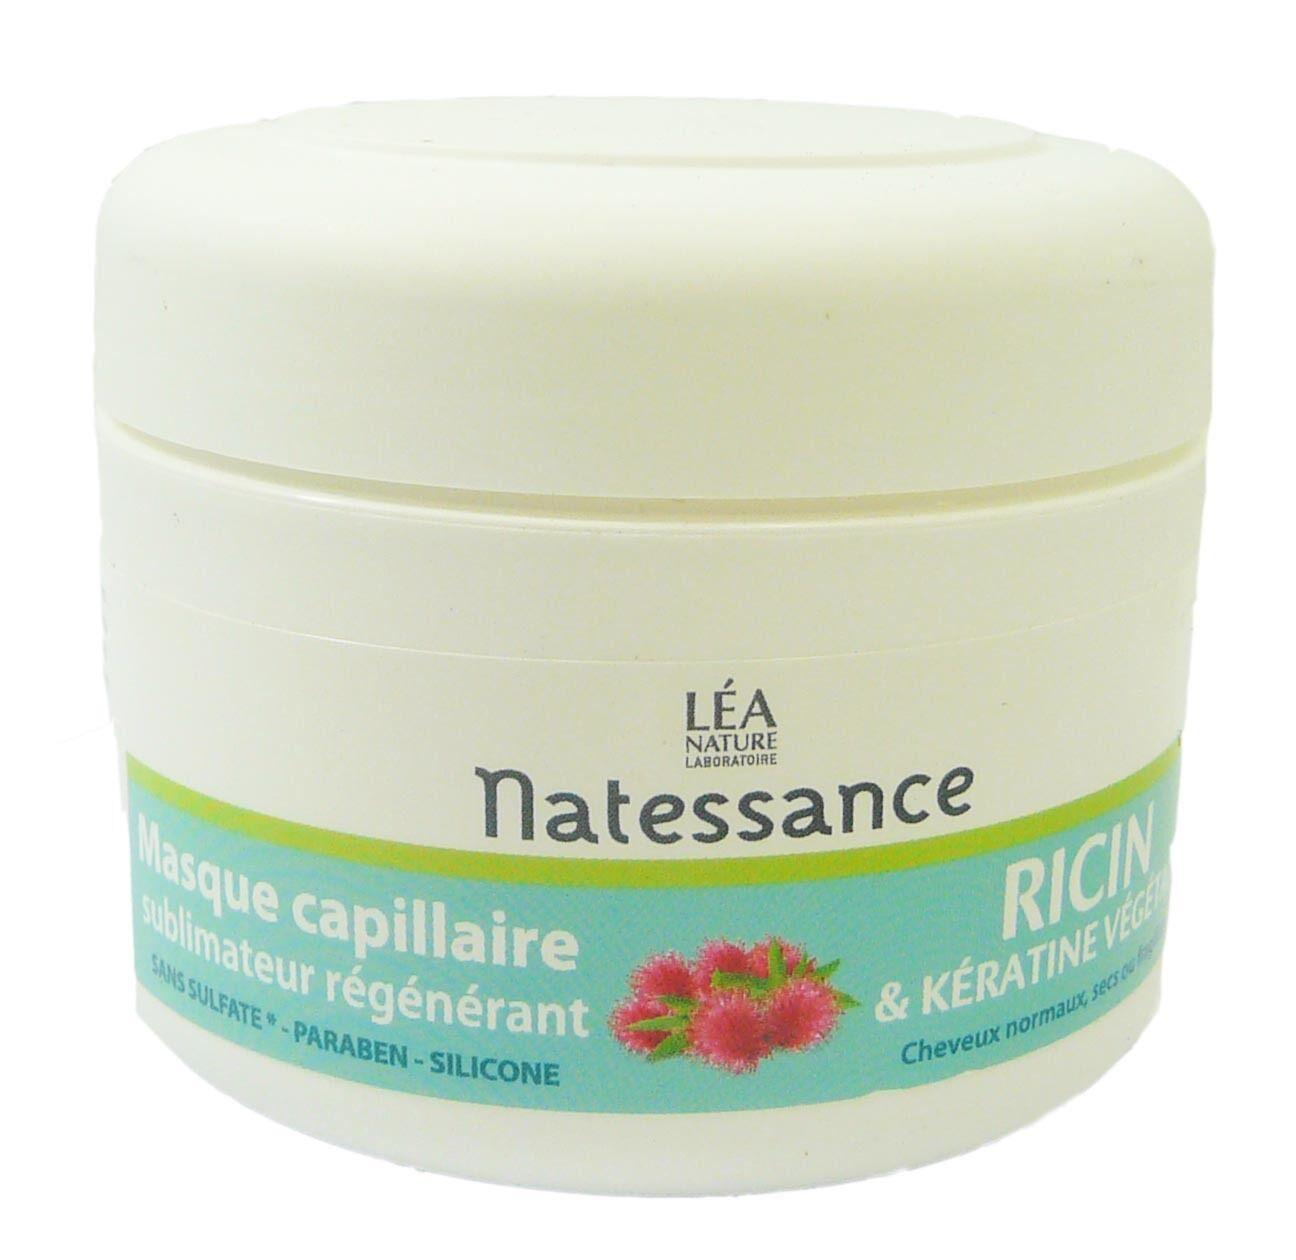 Natessance masque capillaire a l'huile de ricin 200ml